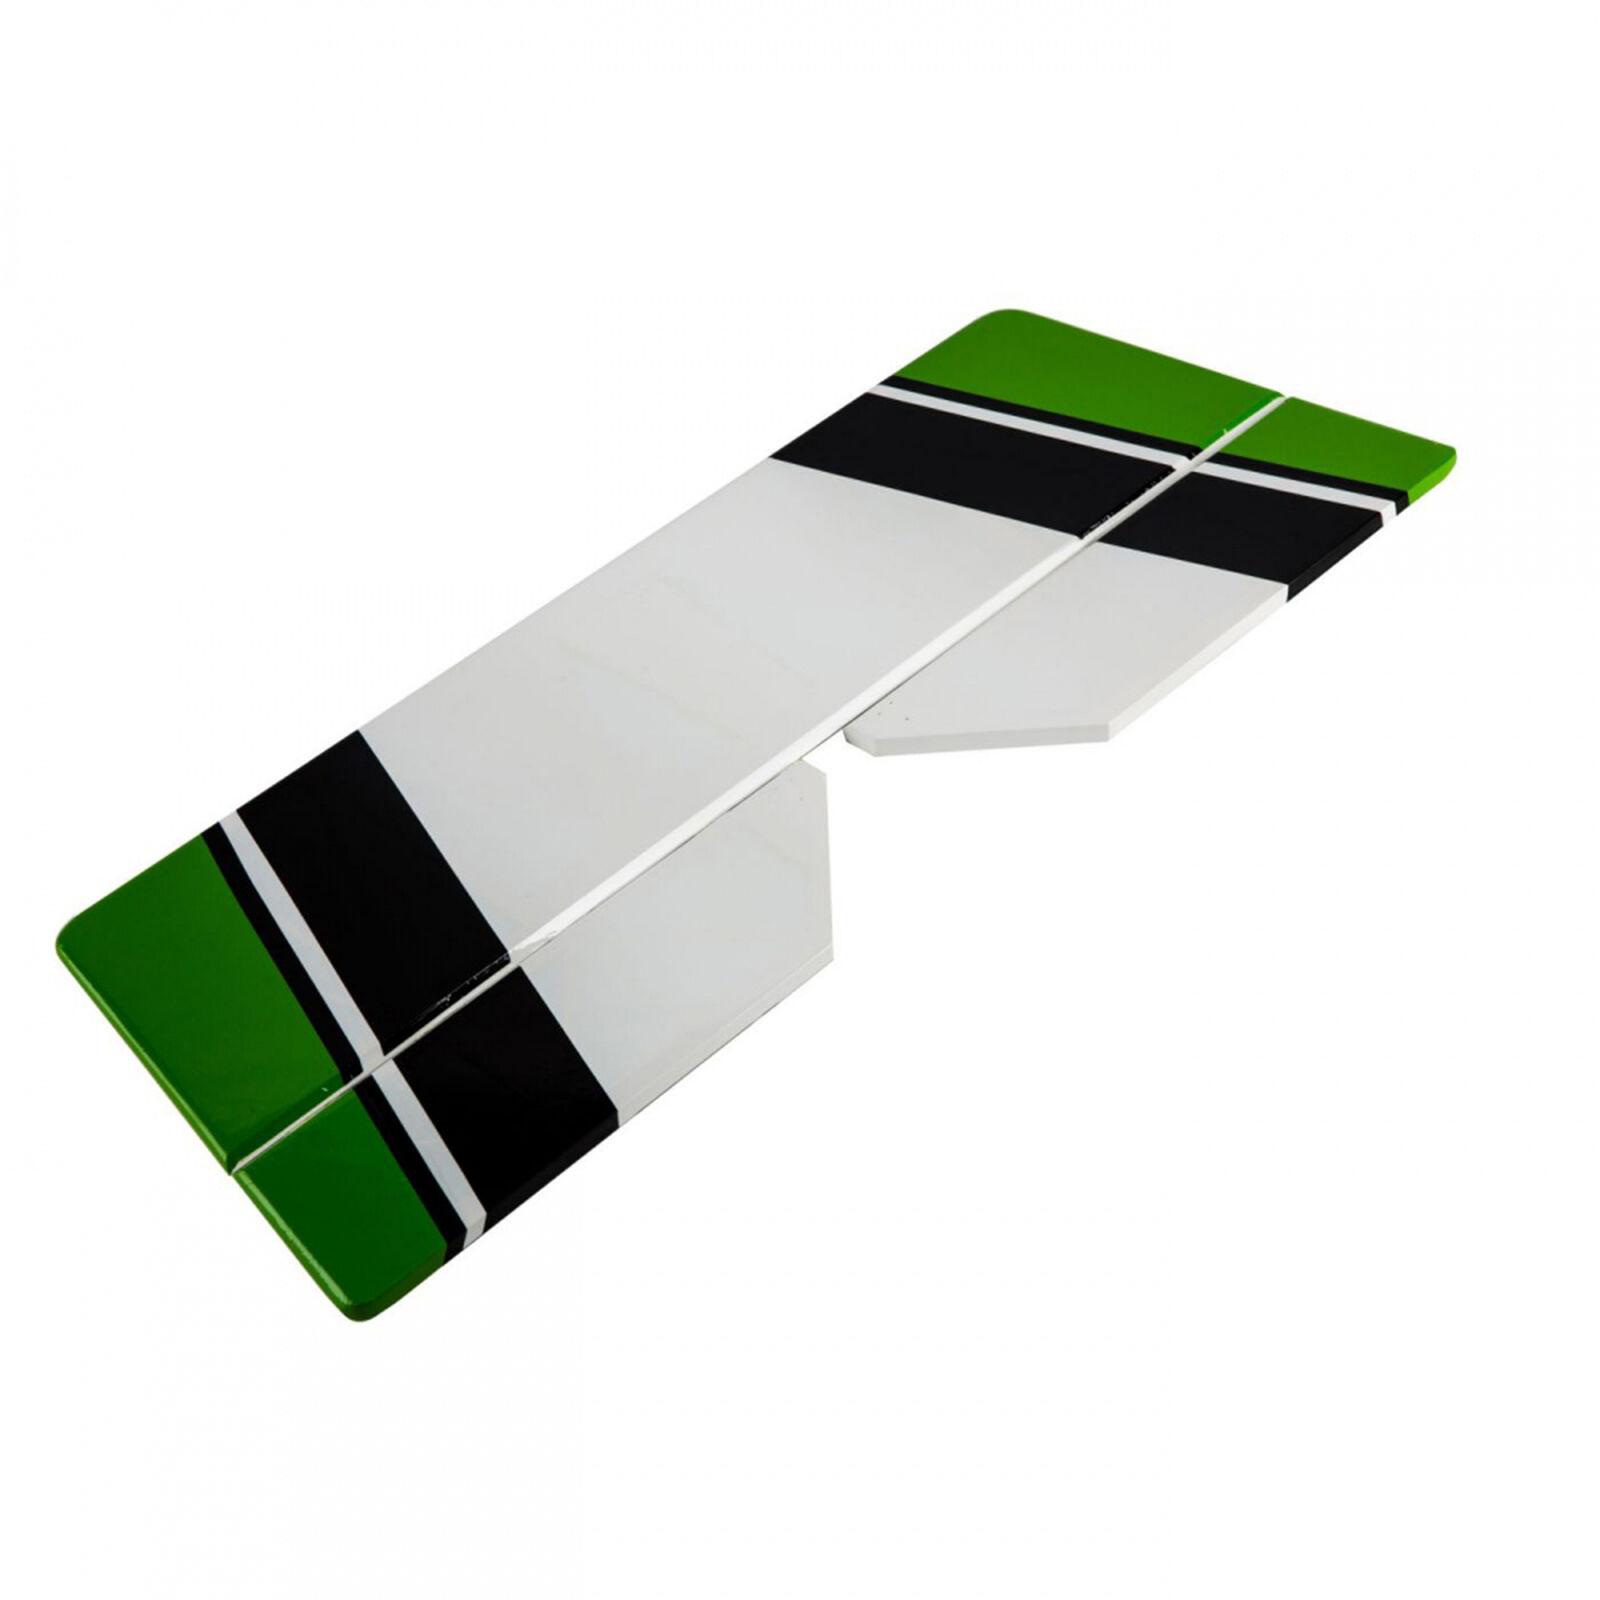 Horizontal Stab with Elevators: Ultra Stick 30cc